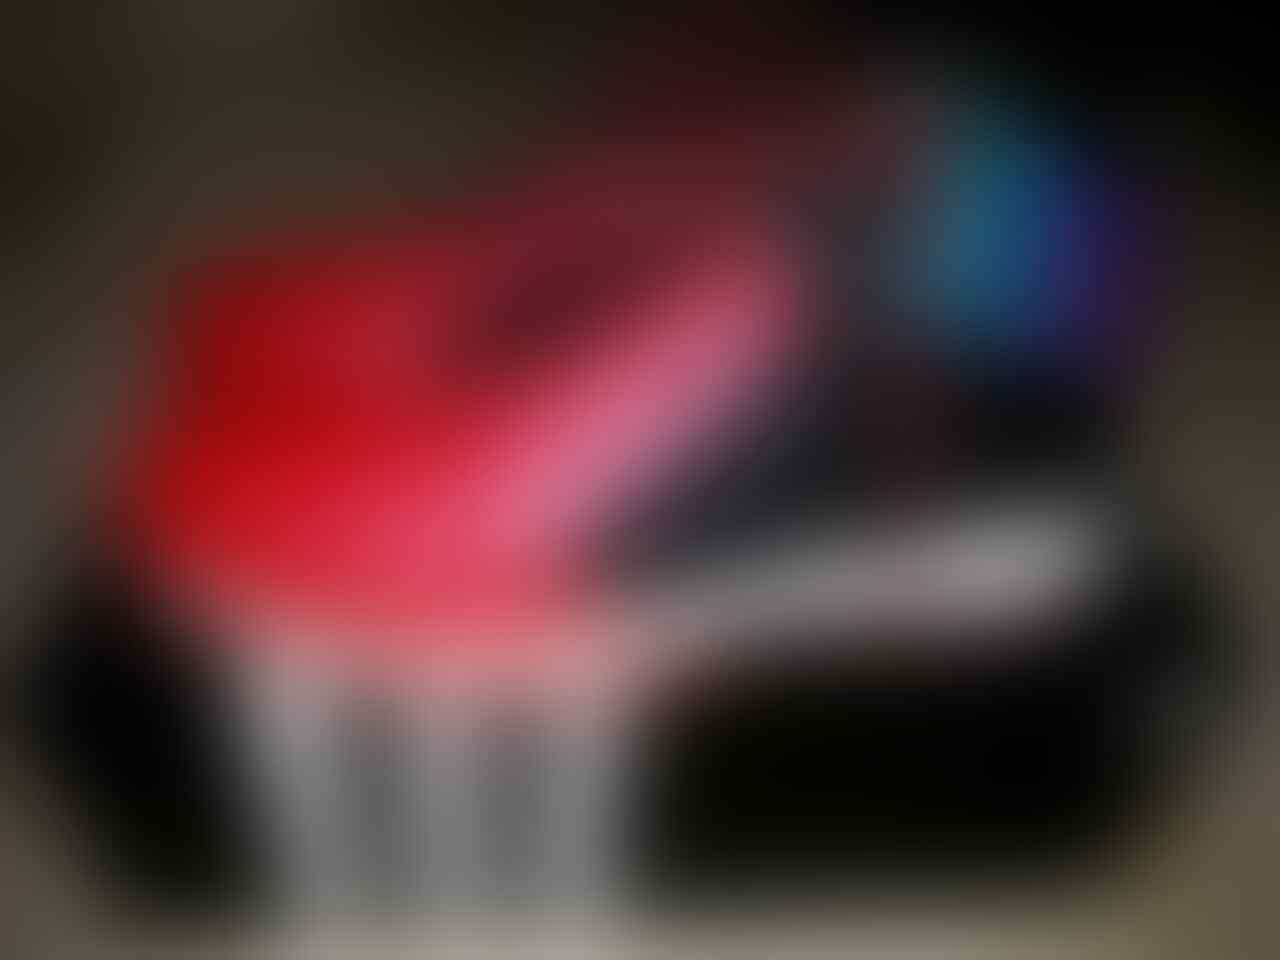 Jual sepatu basket adidas crayz fast 2